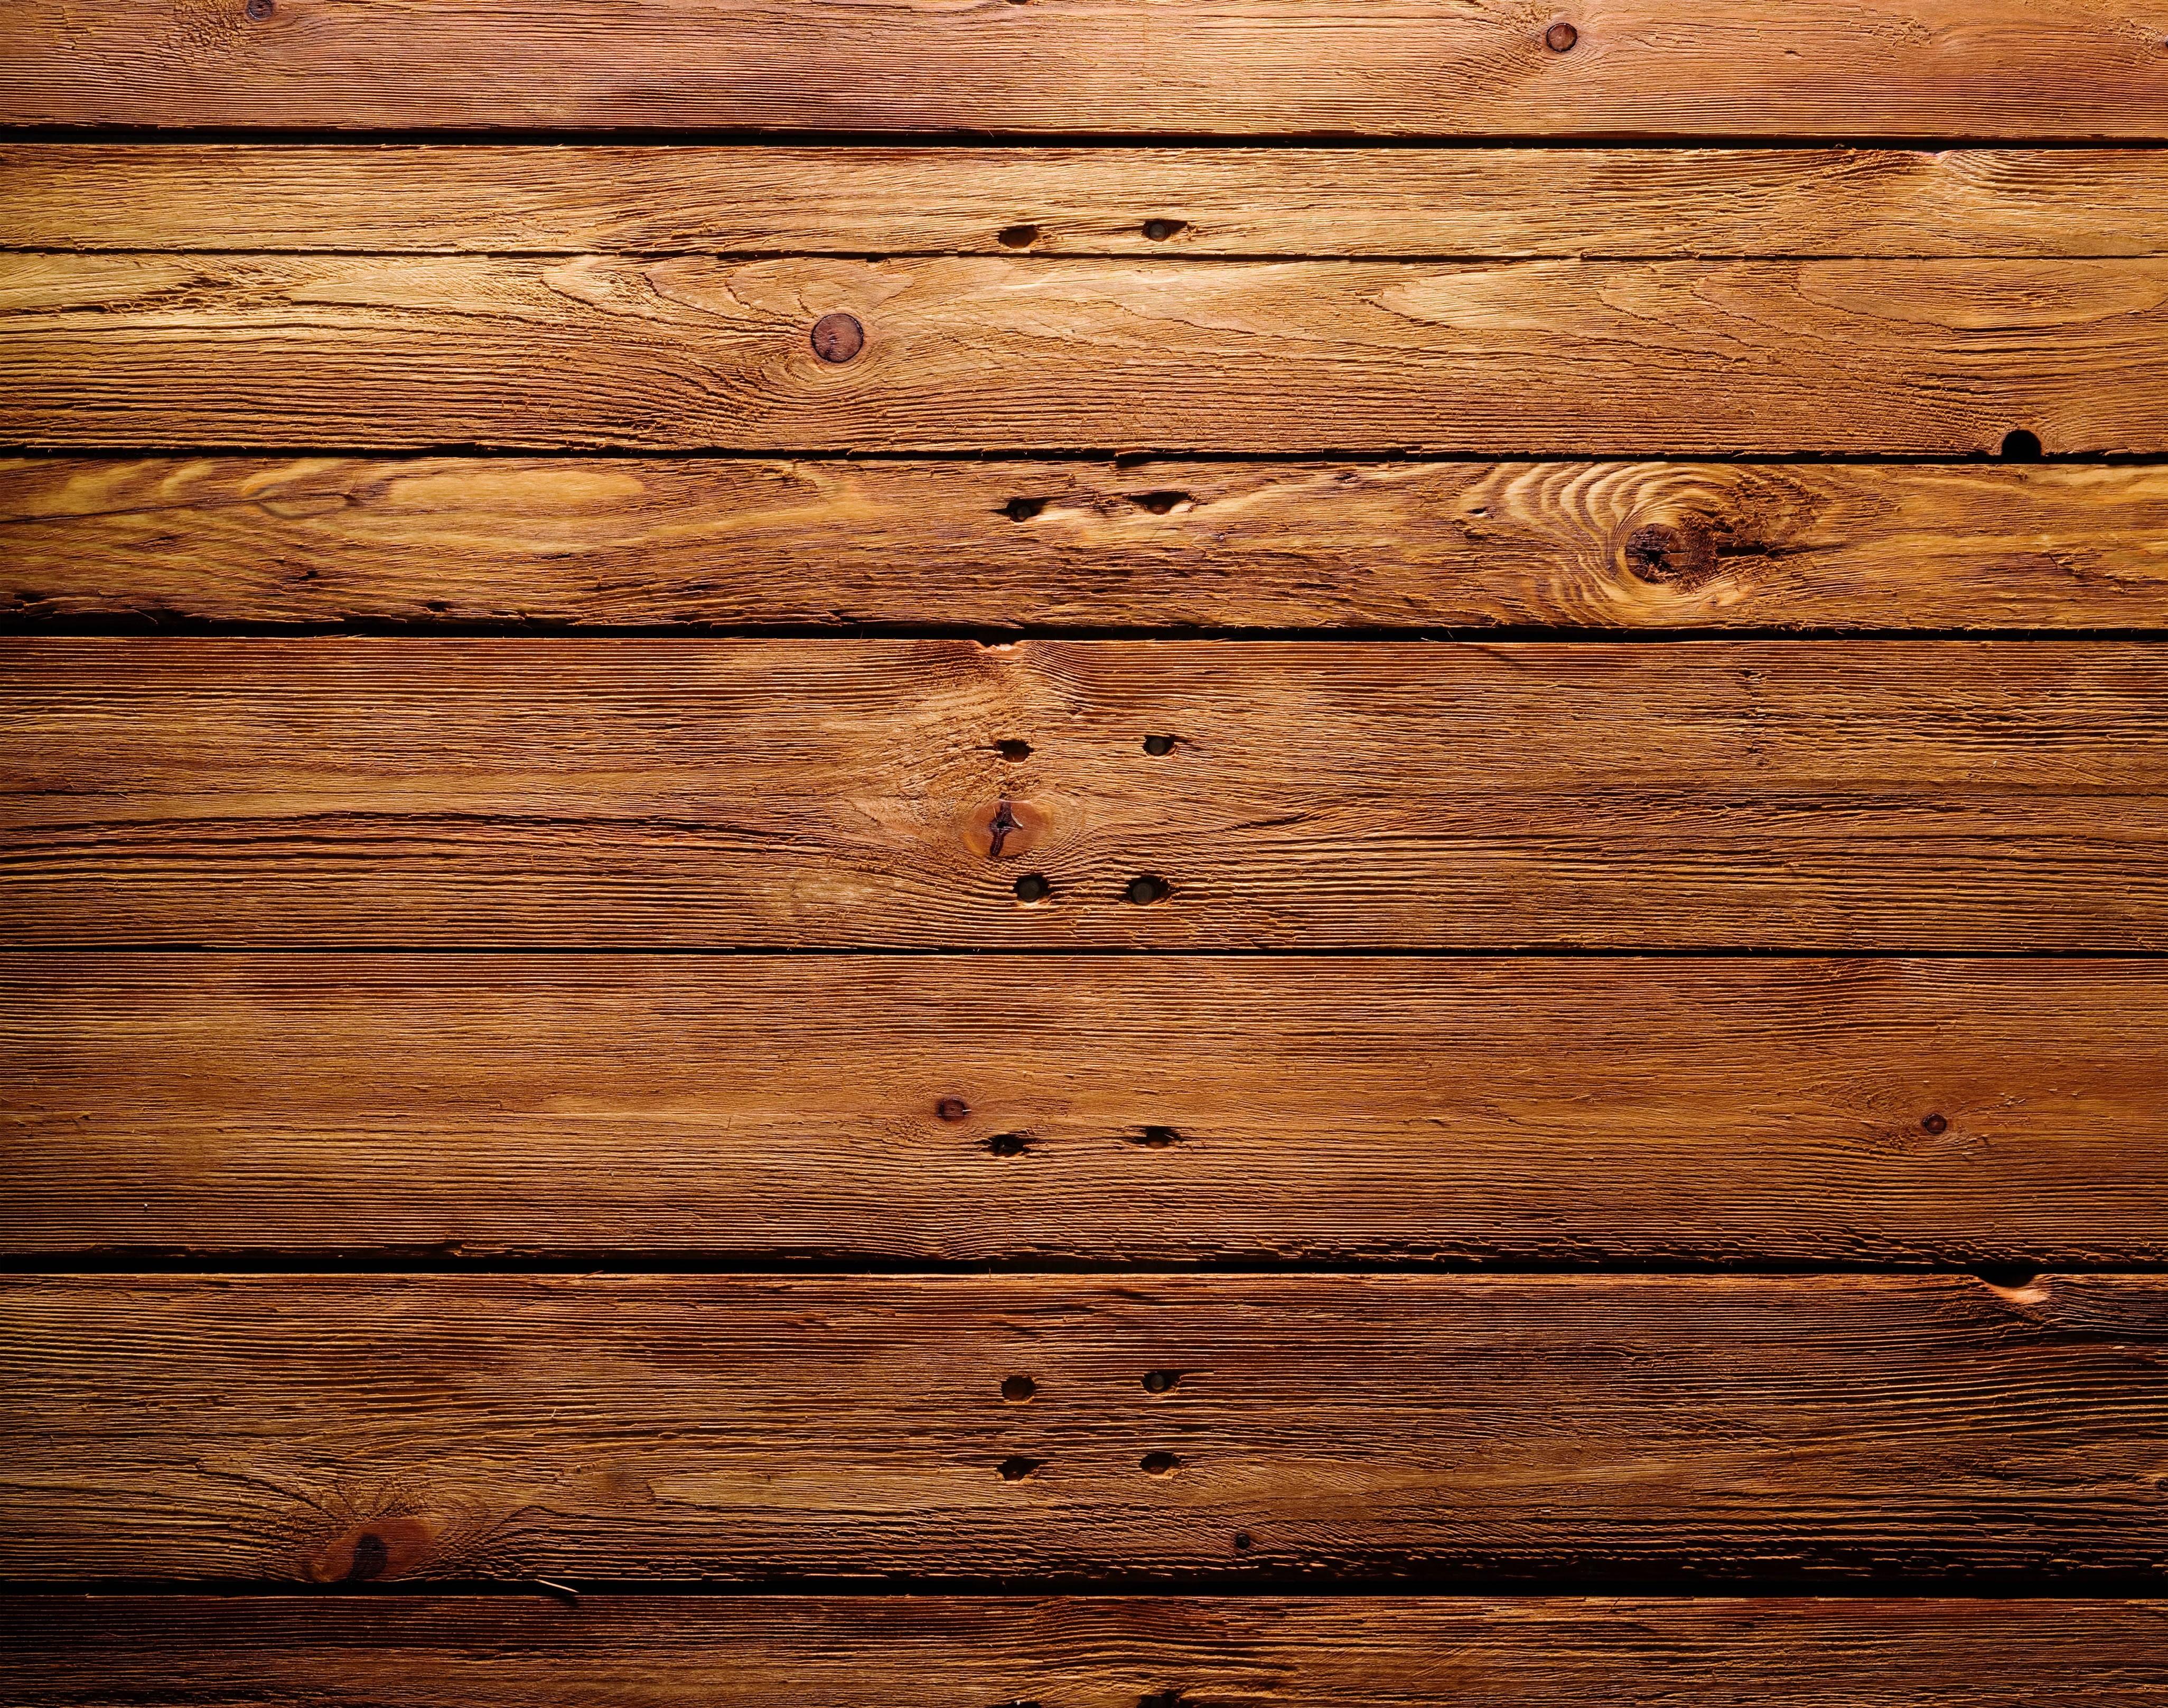 Wallpaper : wooden surface, closeup, texture, timber